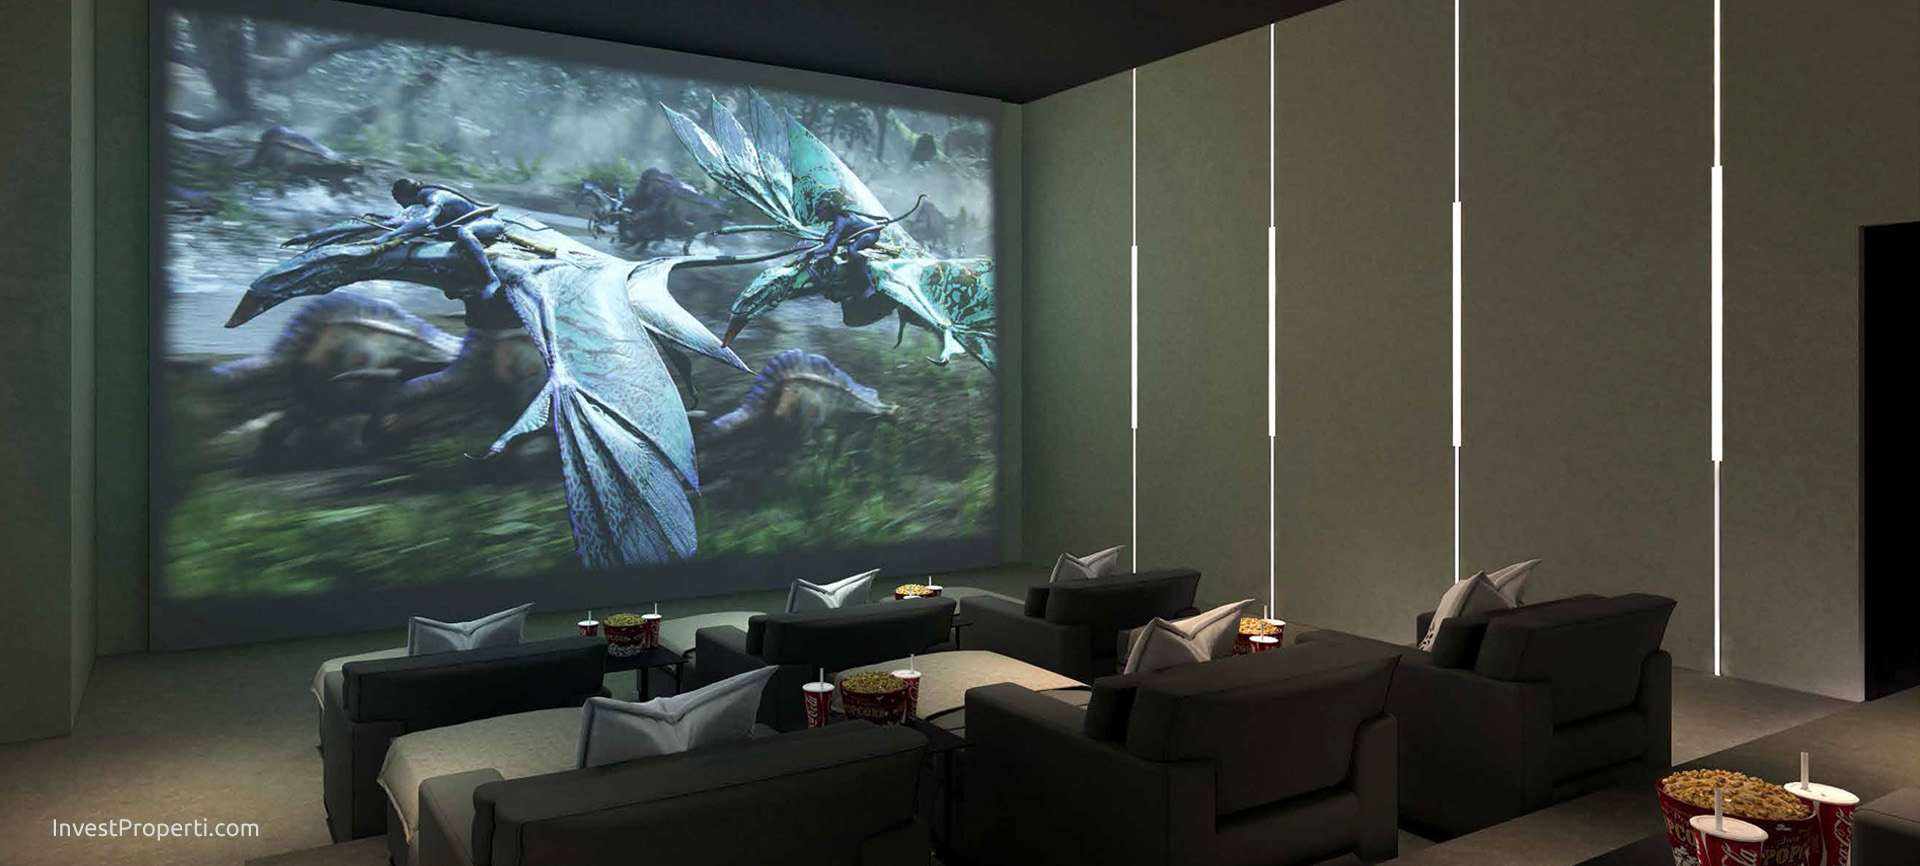 Wang Residence Movie Room